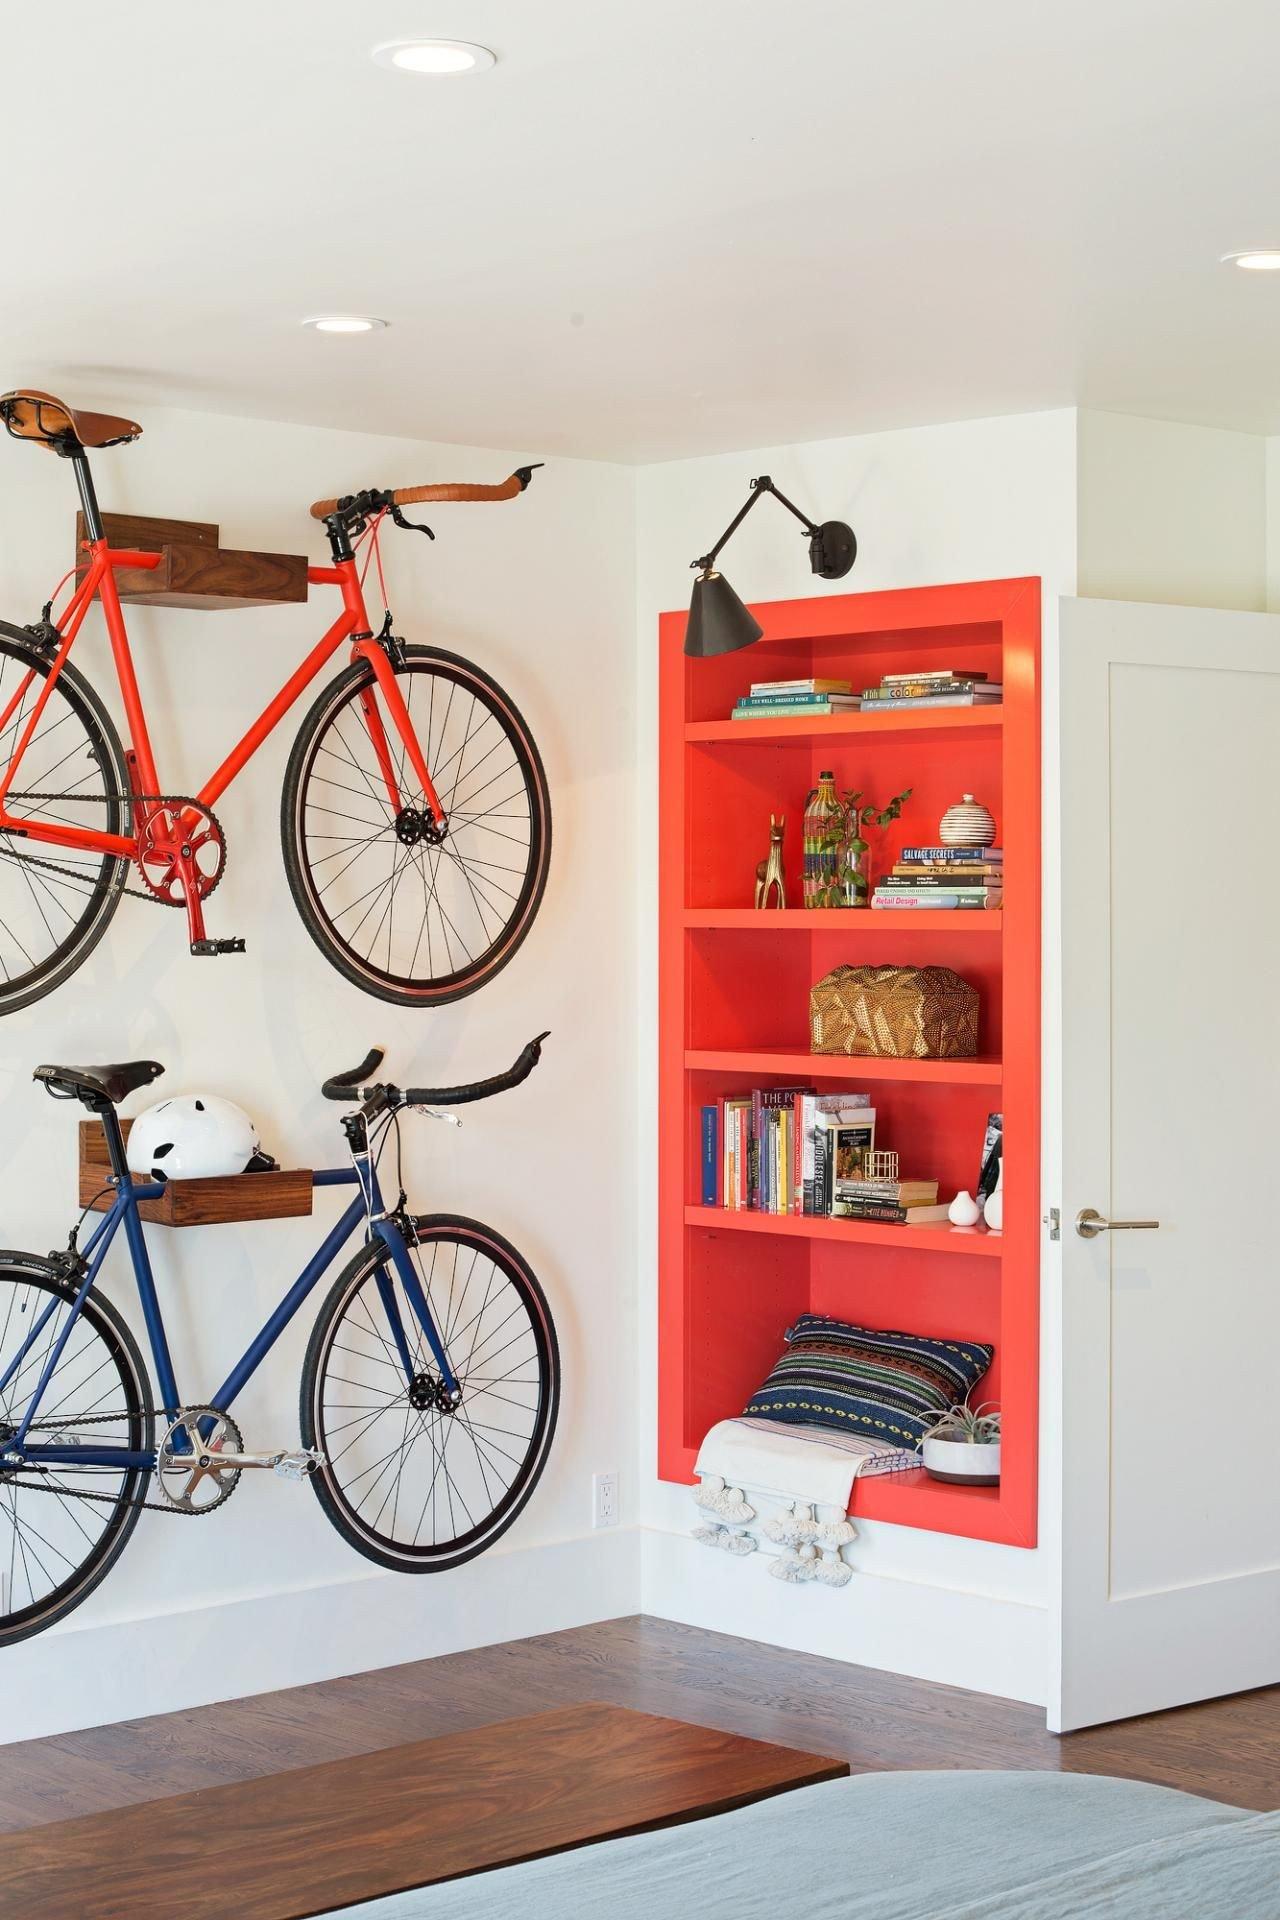 Dirt Bike Bedroom Set New Transitional Bedroom with Bike Storage